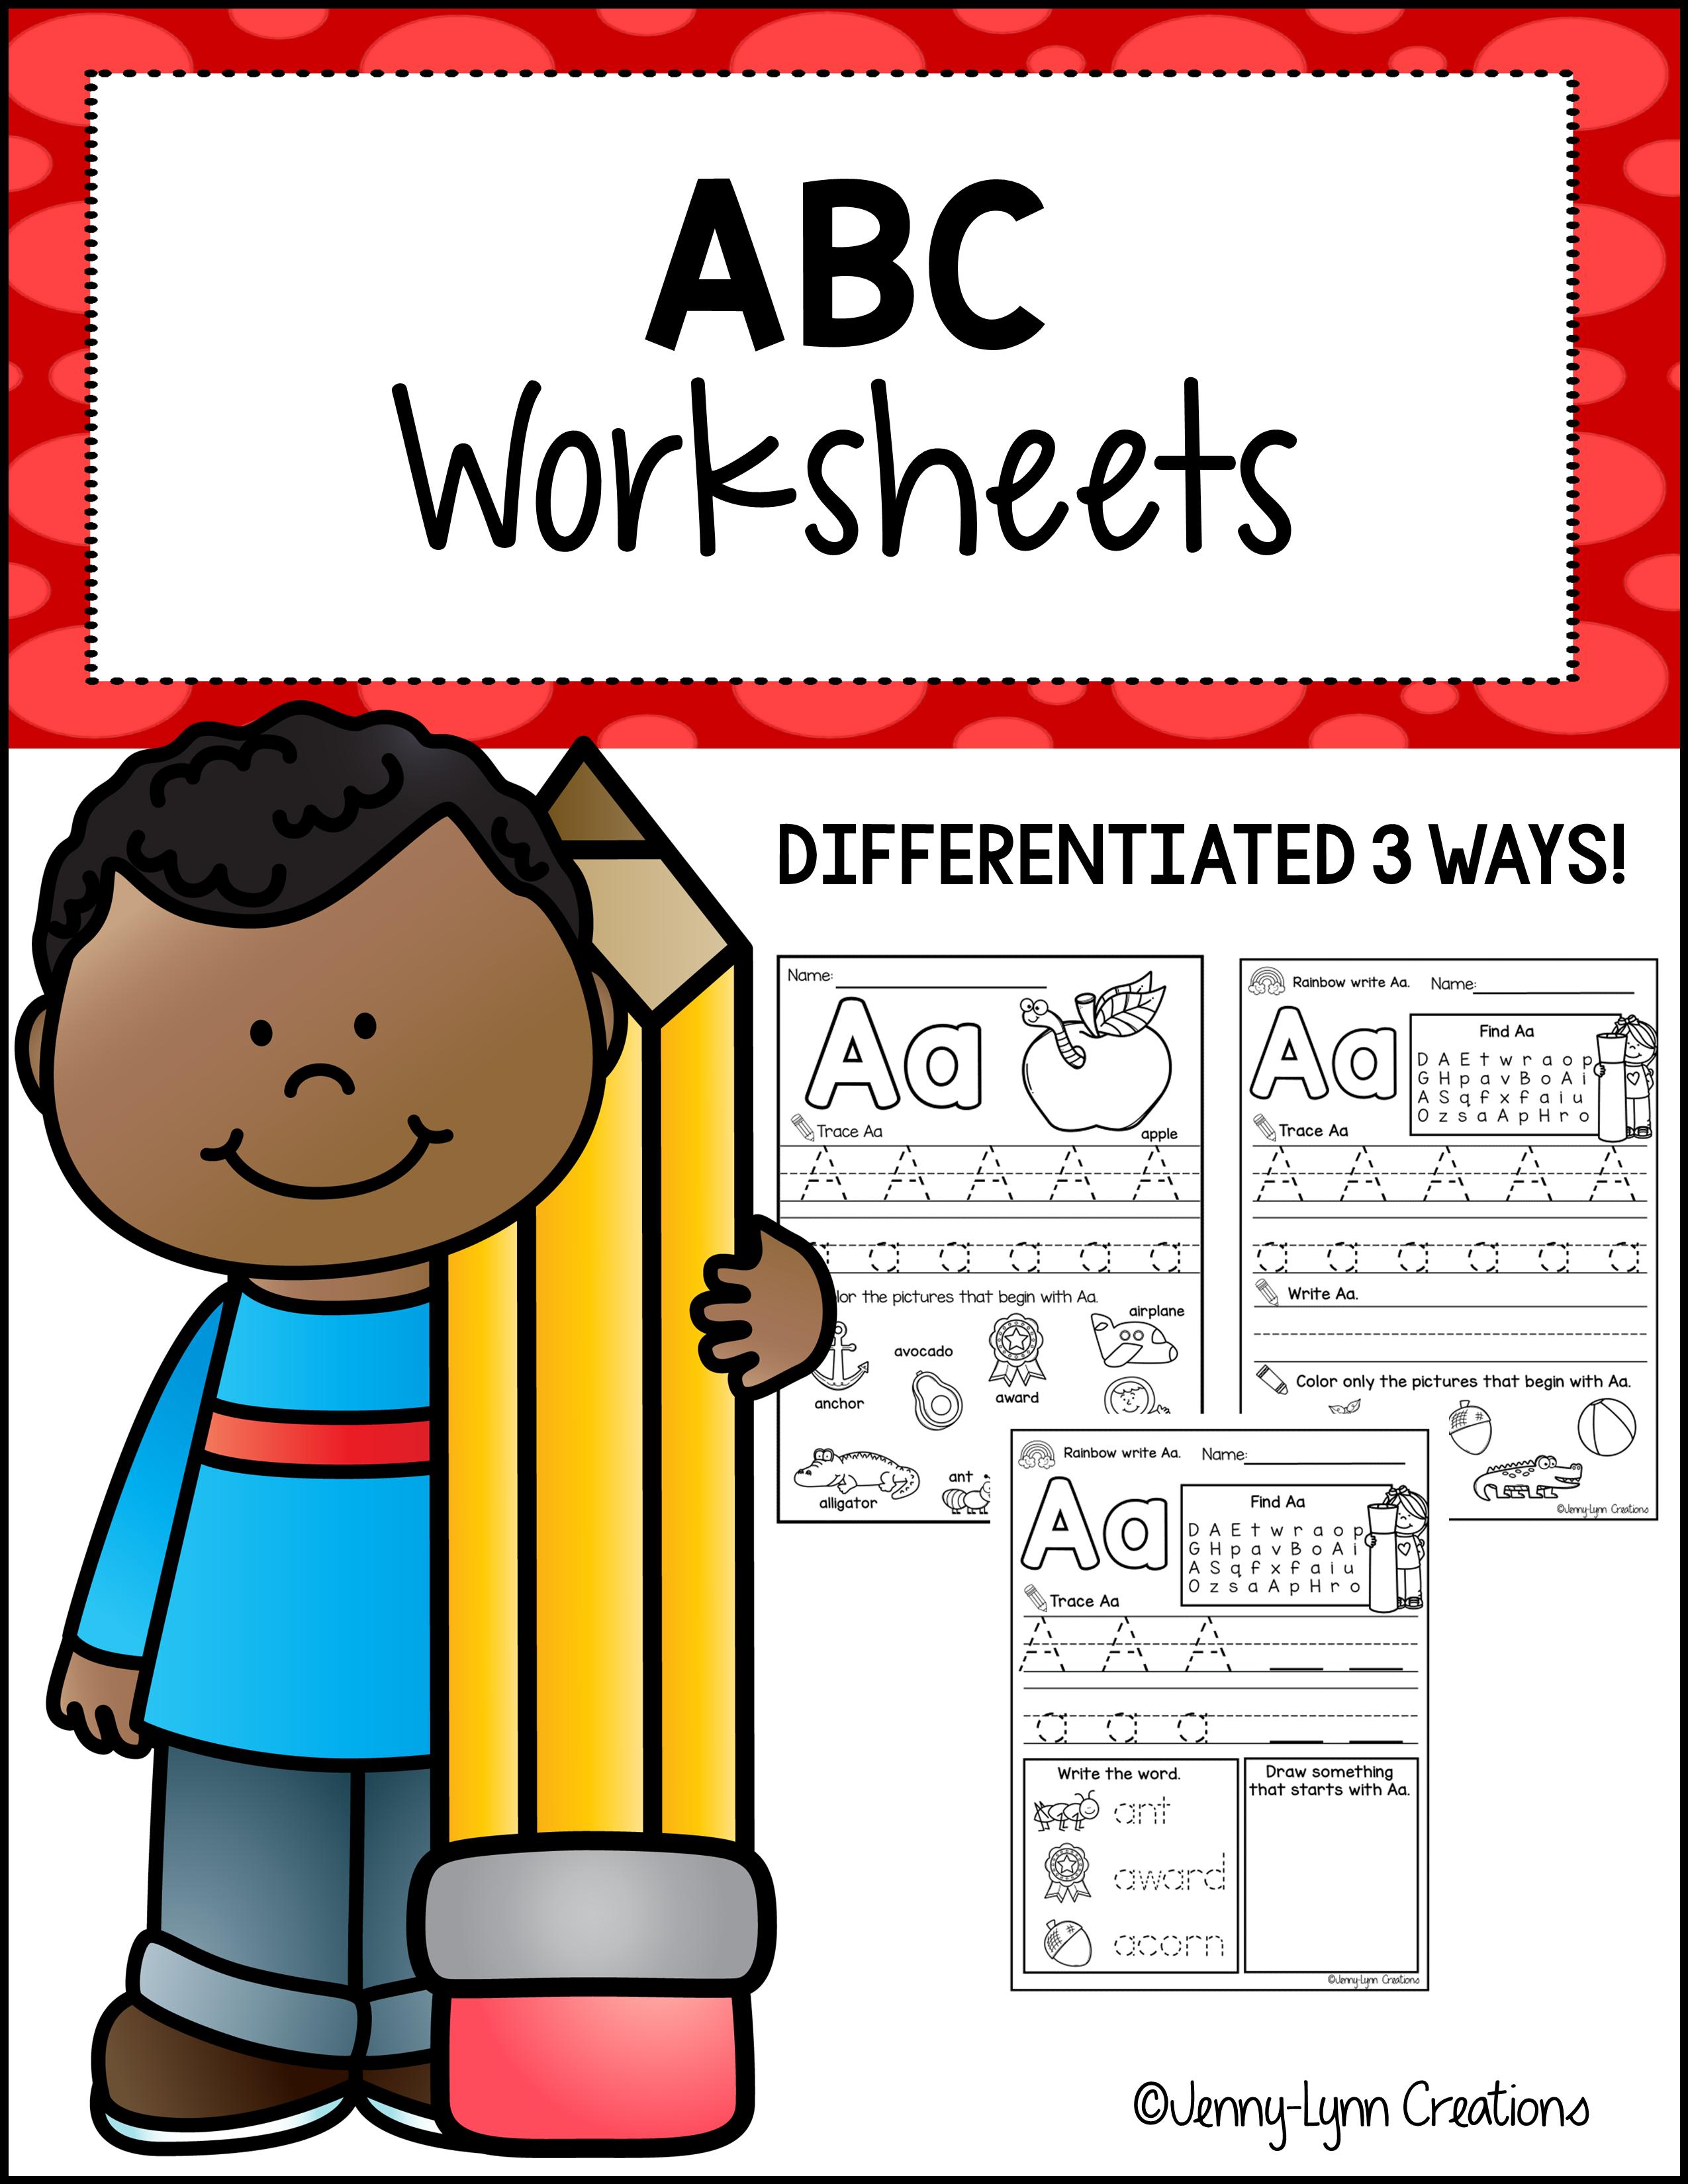 ABC Worksheets - Printable PDF Activities